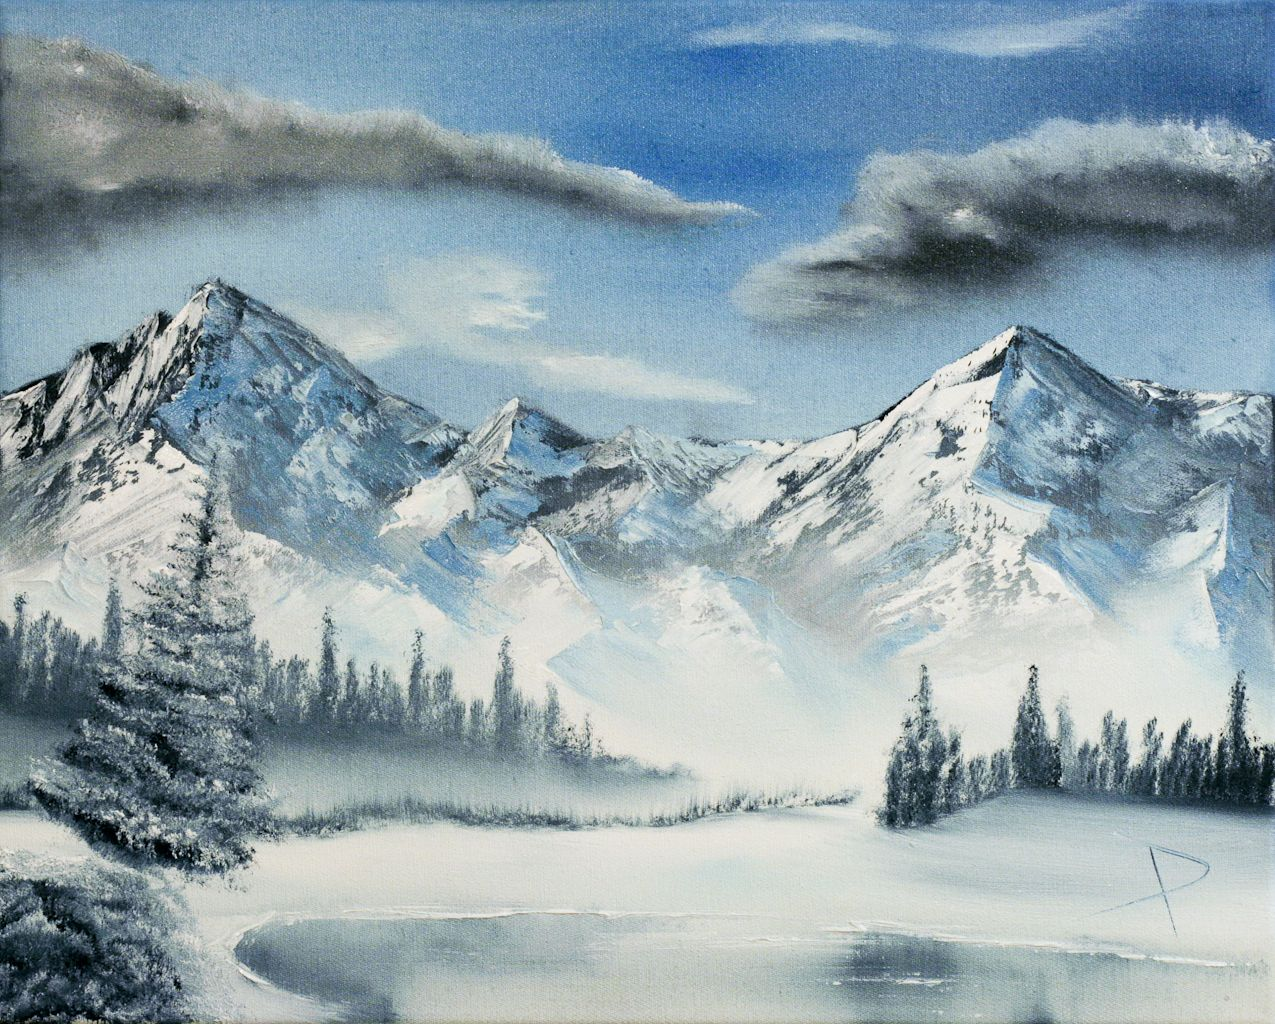 Art Winter Scenes Mountains Scenes Gallery Art For Sale Wintery Mountain Wonderland Mountain Paintings Watercolor Mountains Mountain Scene